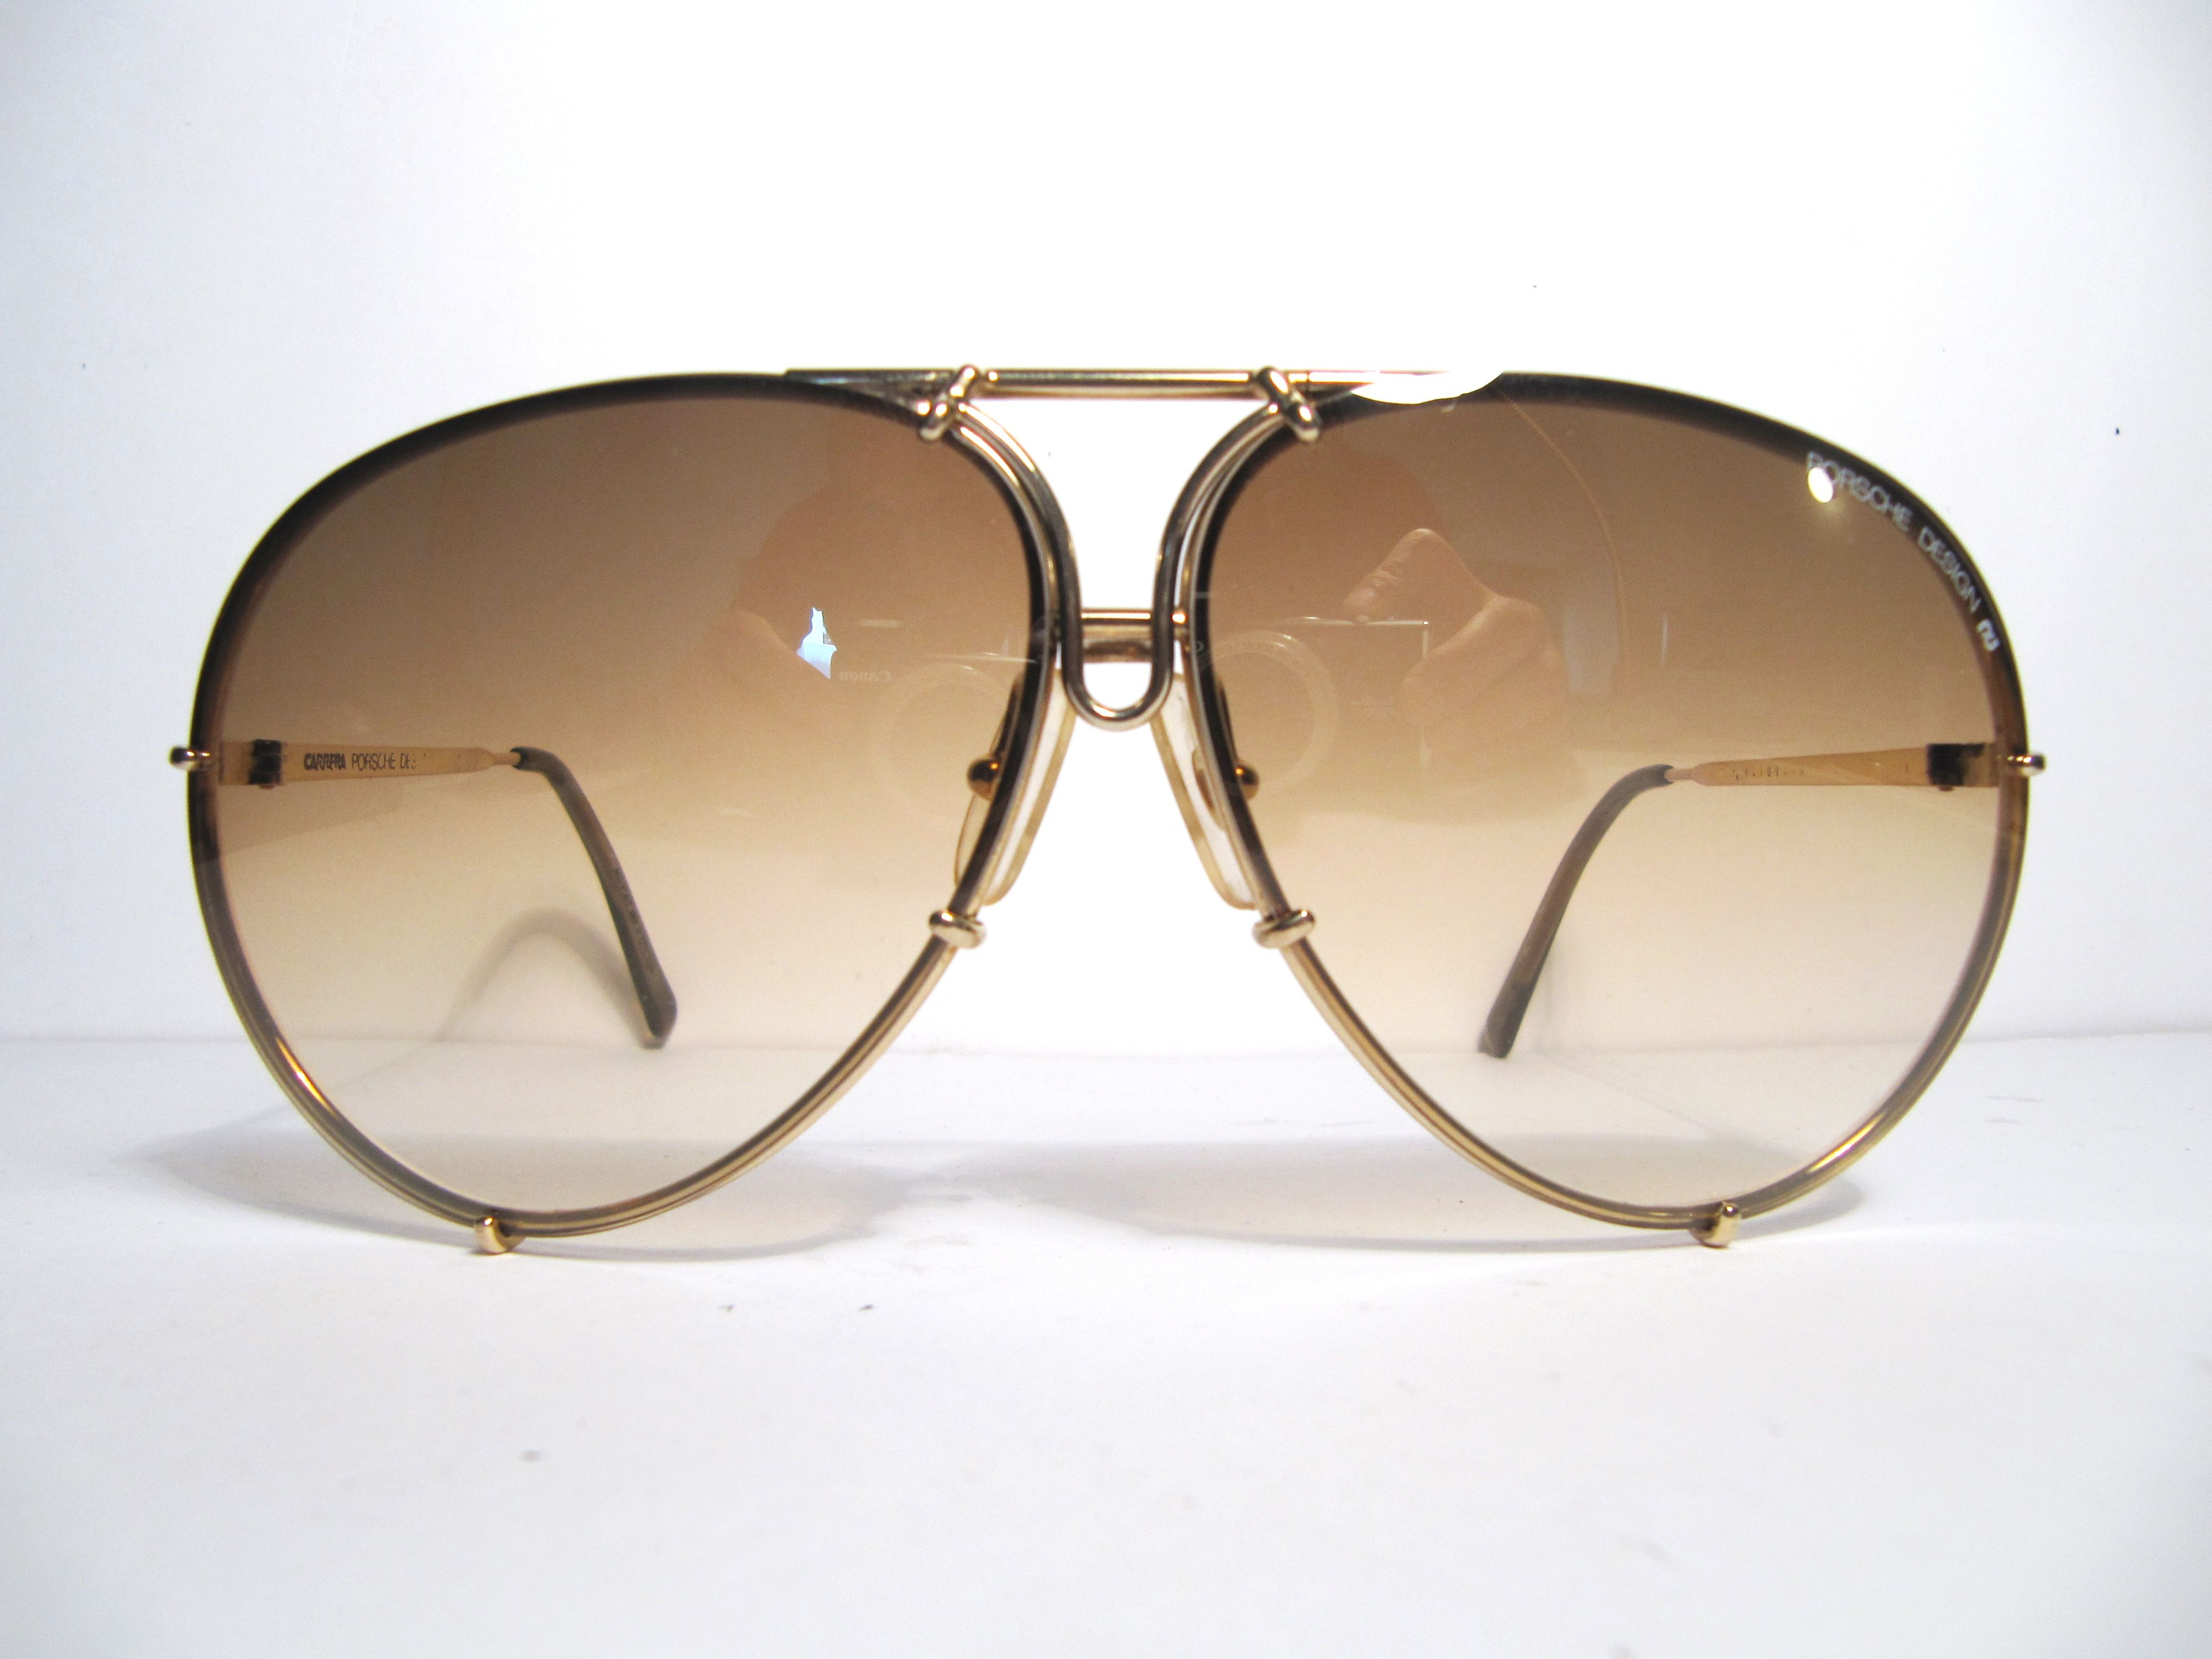 da47168e85818 Pin by Porsche-Deals.com on Porsche Sunglasses   Sunglasses, Porsche ...